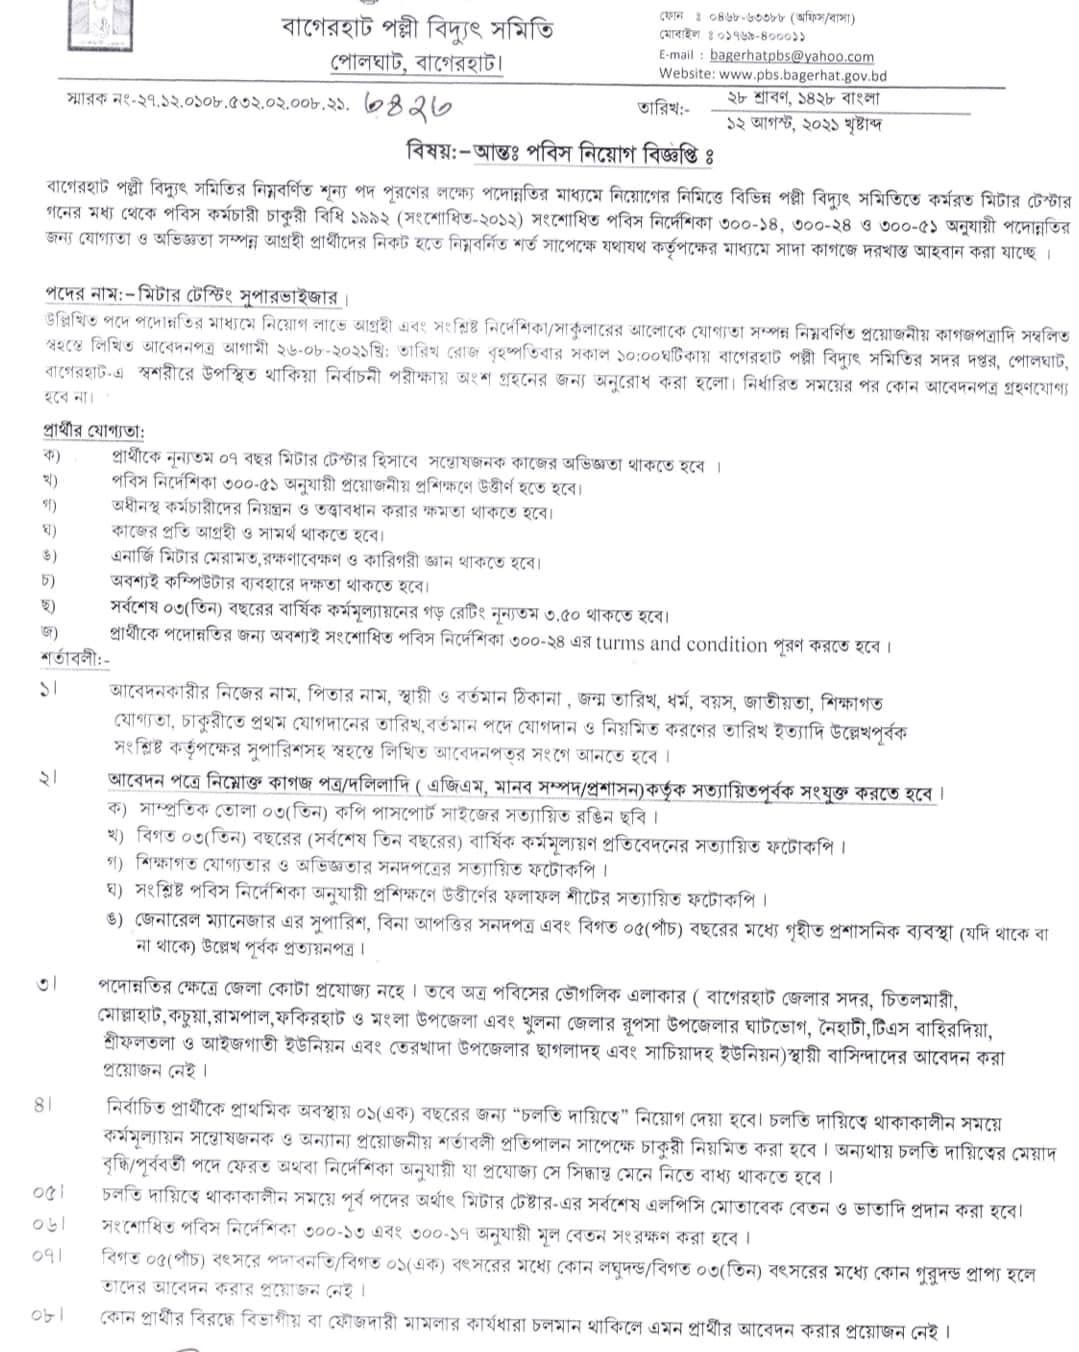 https://bdjobs24.net/wp-content/uploads/2021/08/Bangladesh-Rural-Electrification-Board-Job-Circular-2021-18-1.jpg